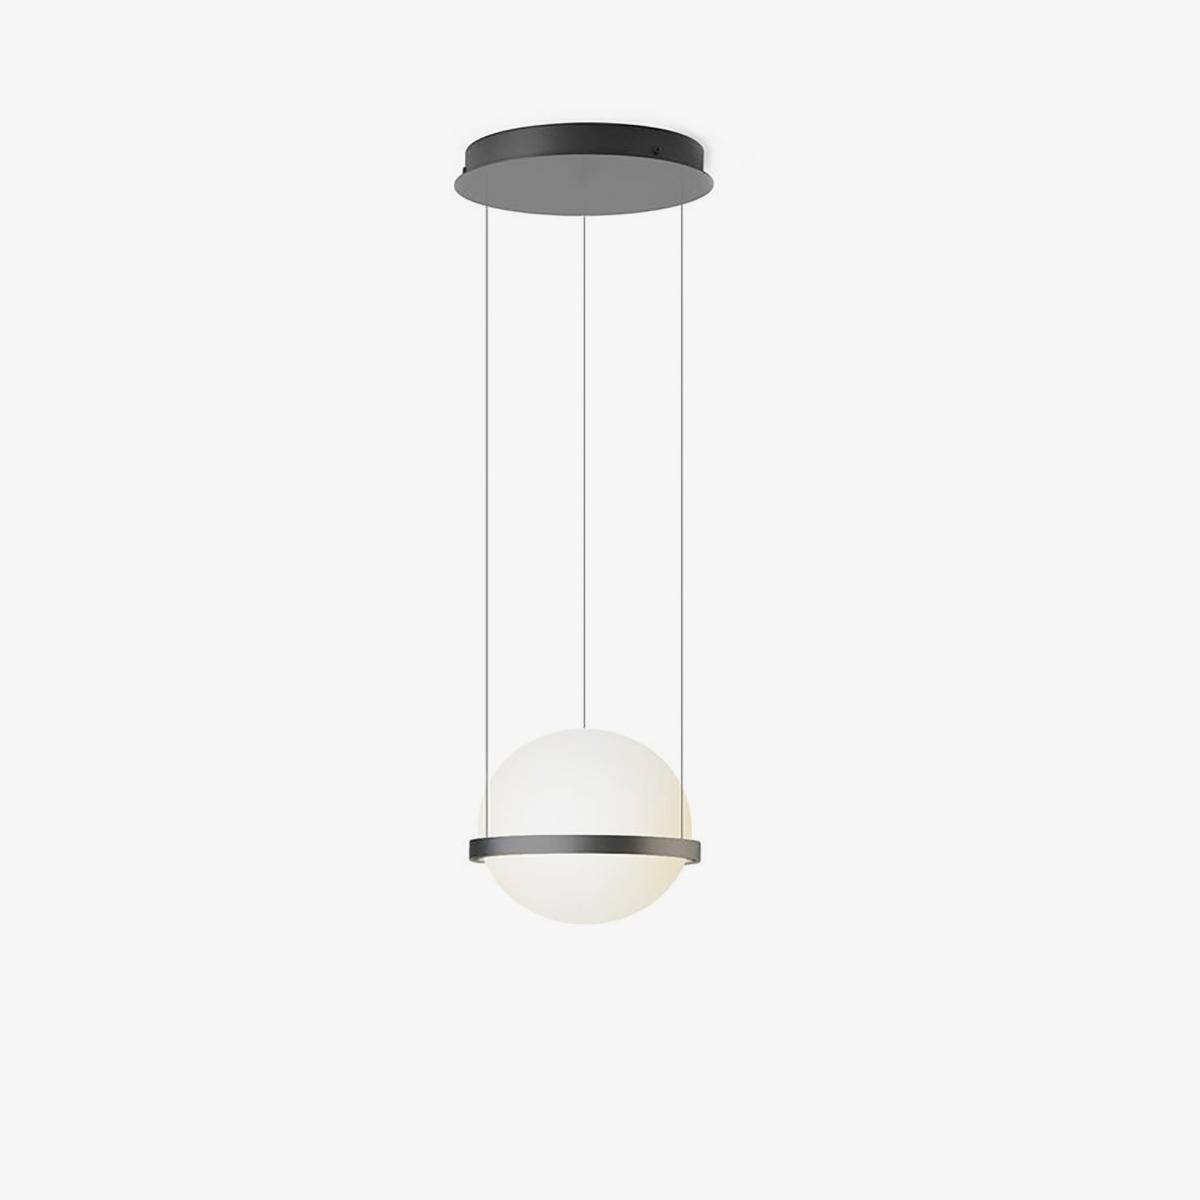 Lámpara colgante Palma esfera grafito Vibia-0